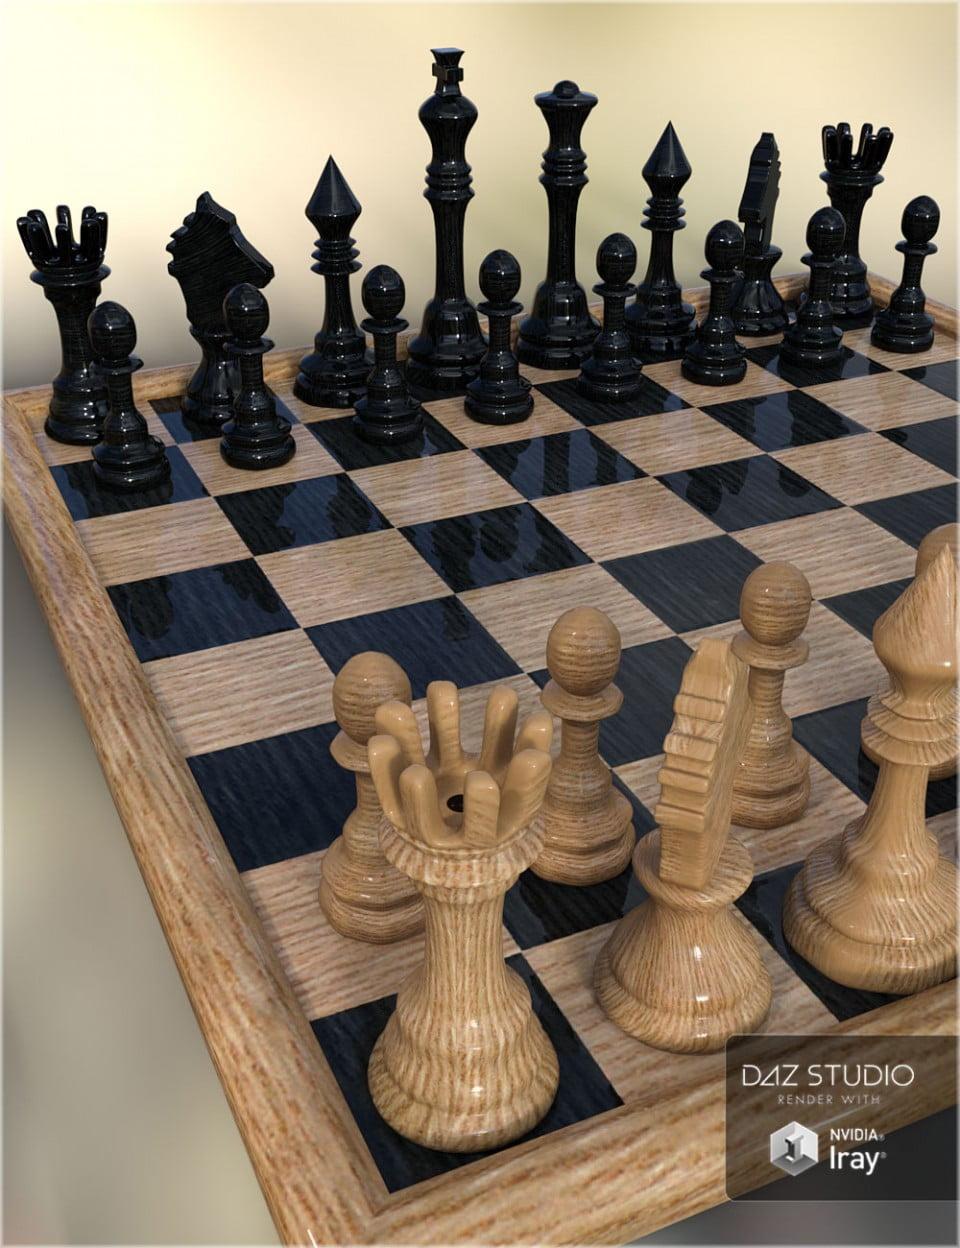 00-main-rw-classic-chess-daz3d